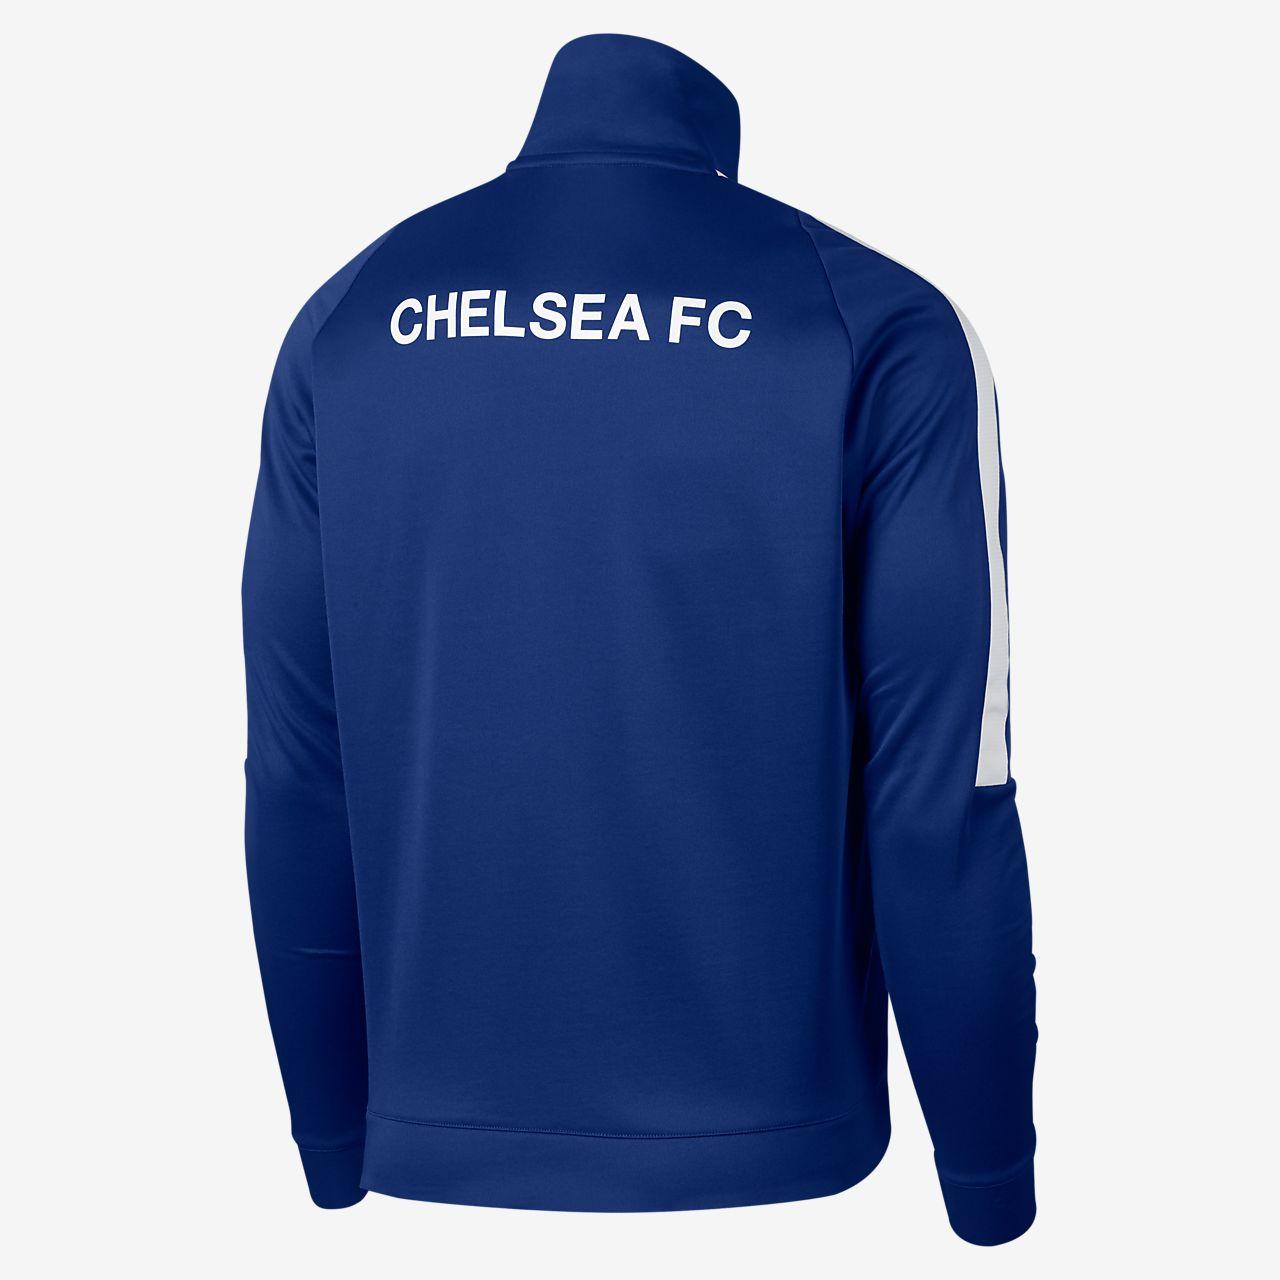 ... Chelsea FC Franchise Men's Football Jacket